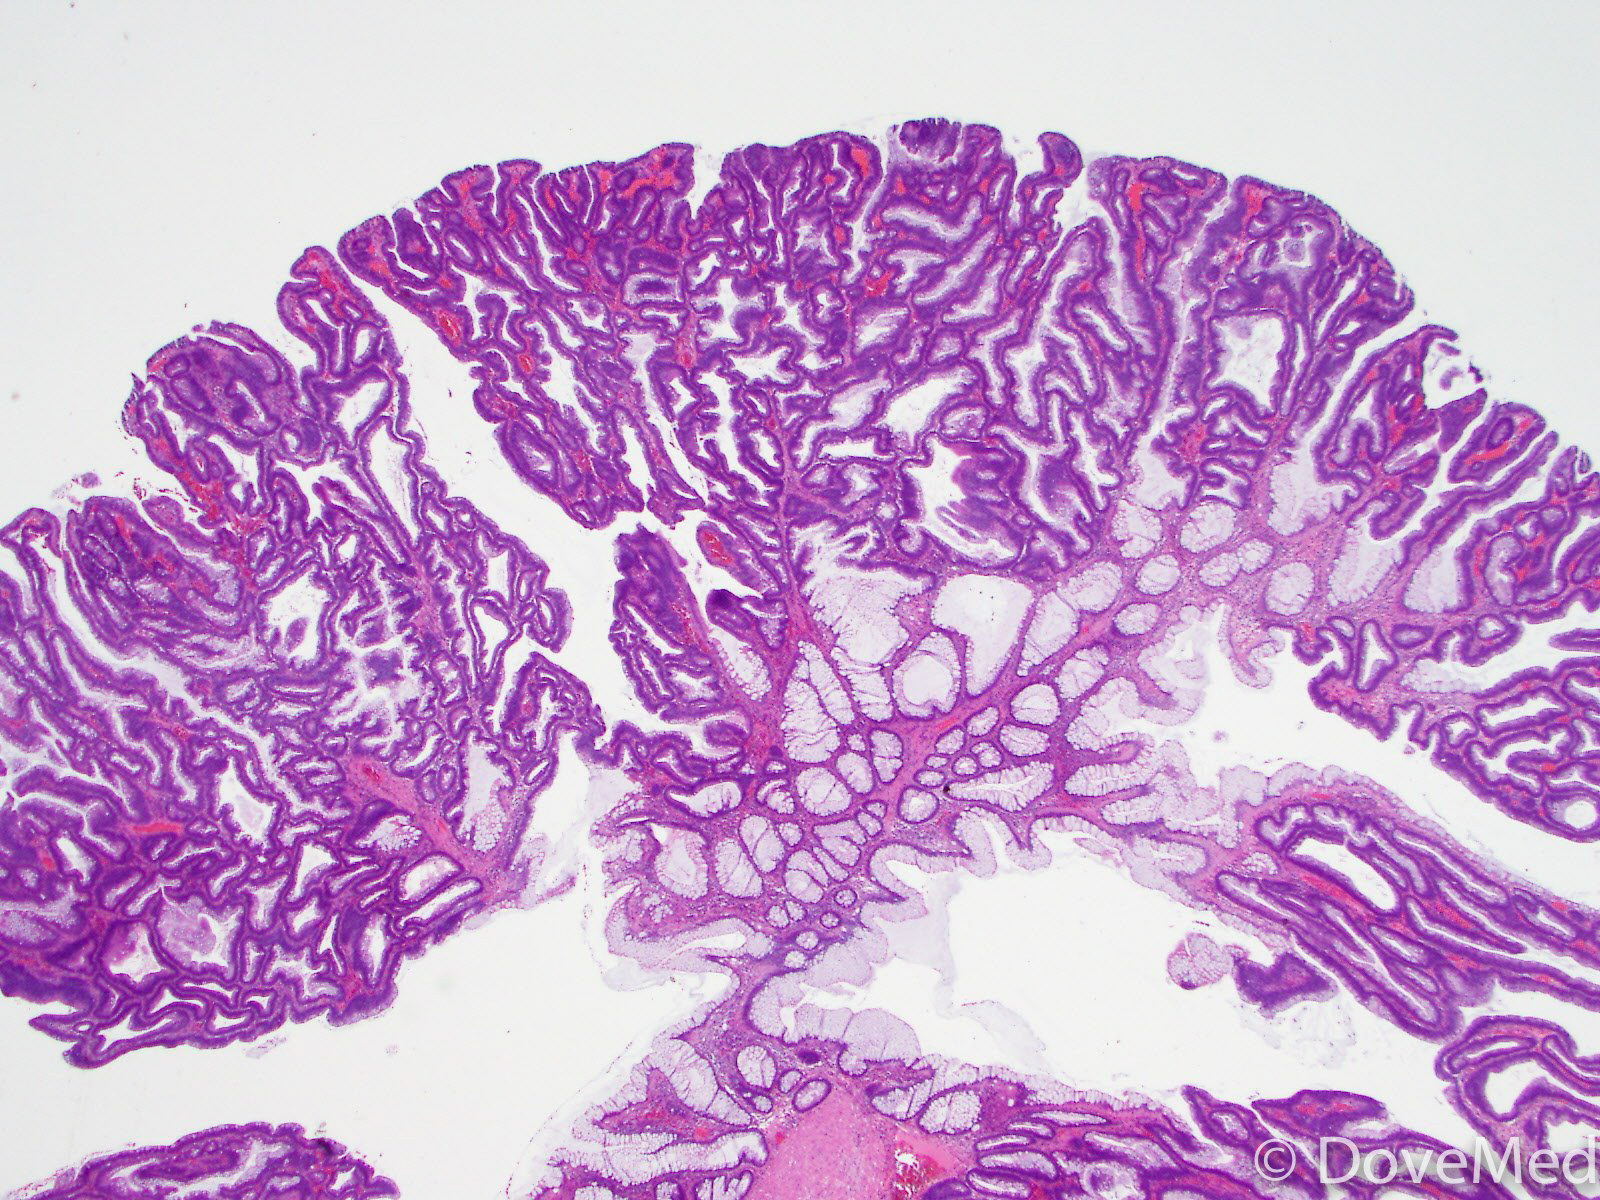 Tubular Adenoma Of The Colon